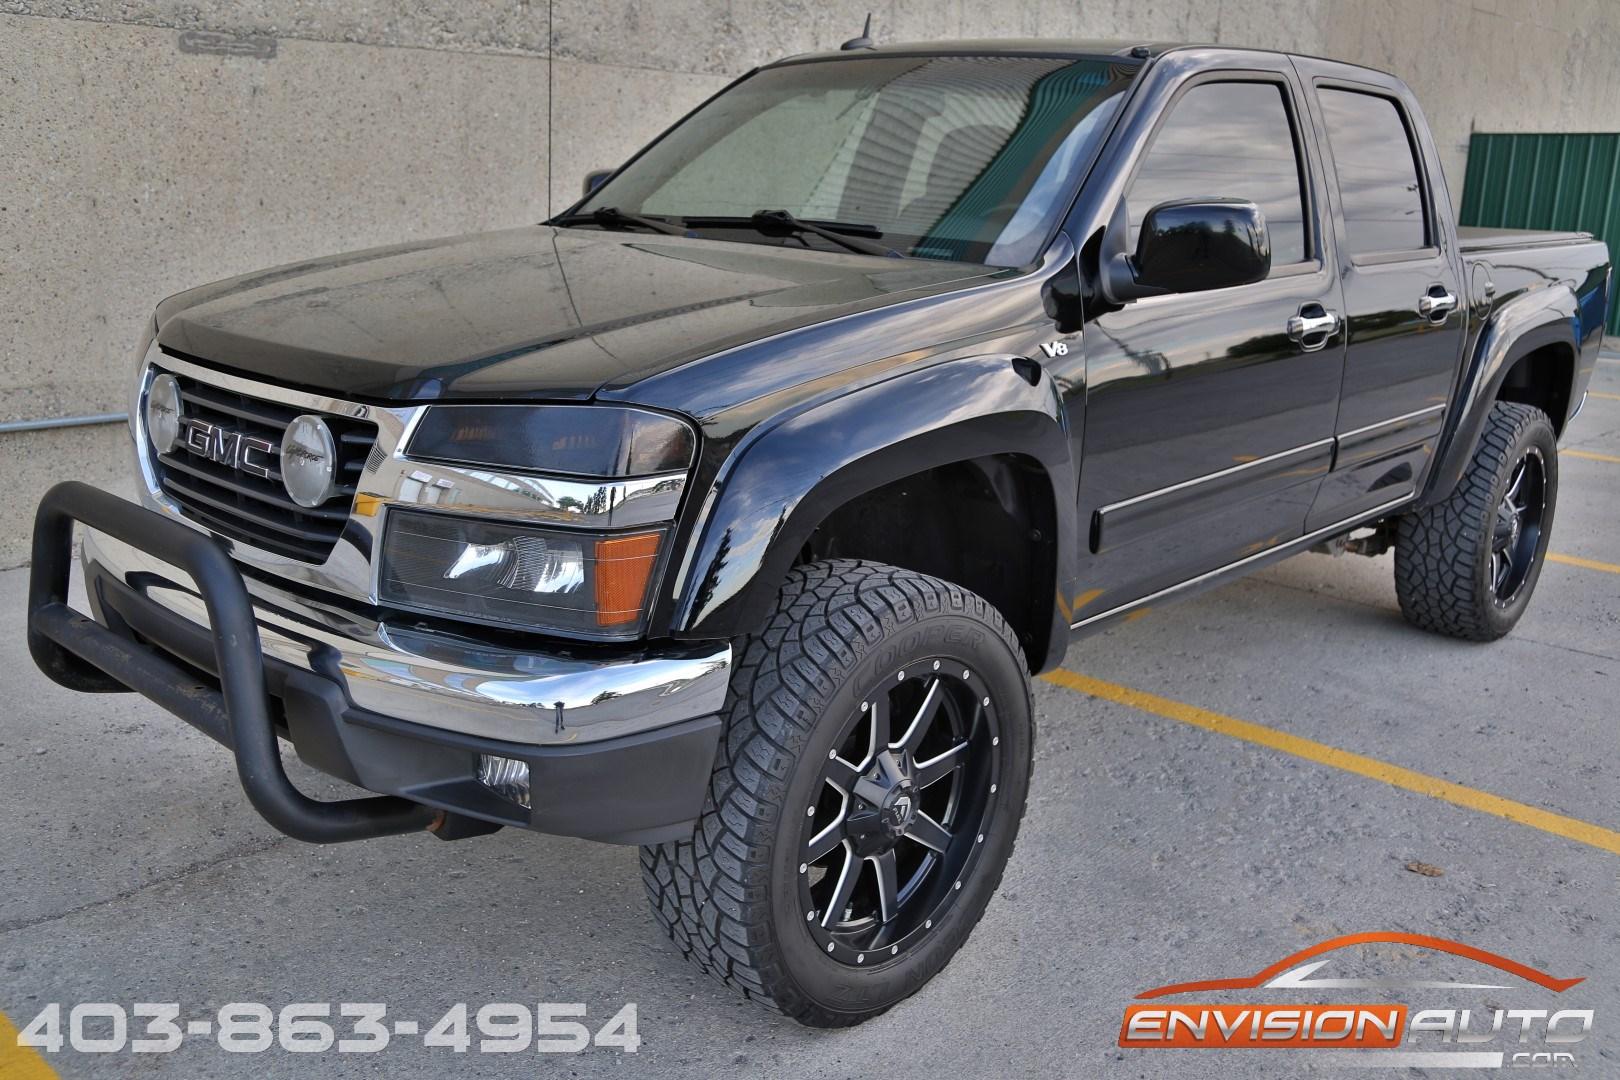 2010 GMC Canyon SLE 4×4 – 5.3L V8 – 20in Fuel Wheels   Envision Auto - Calgary Highline Luxury ...